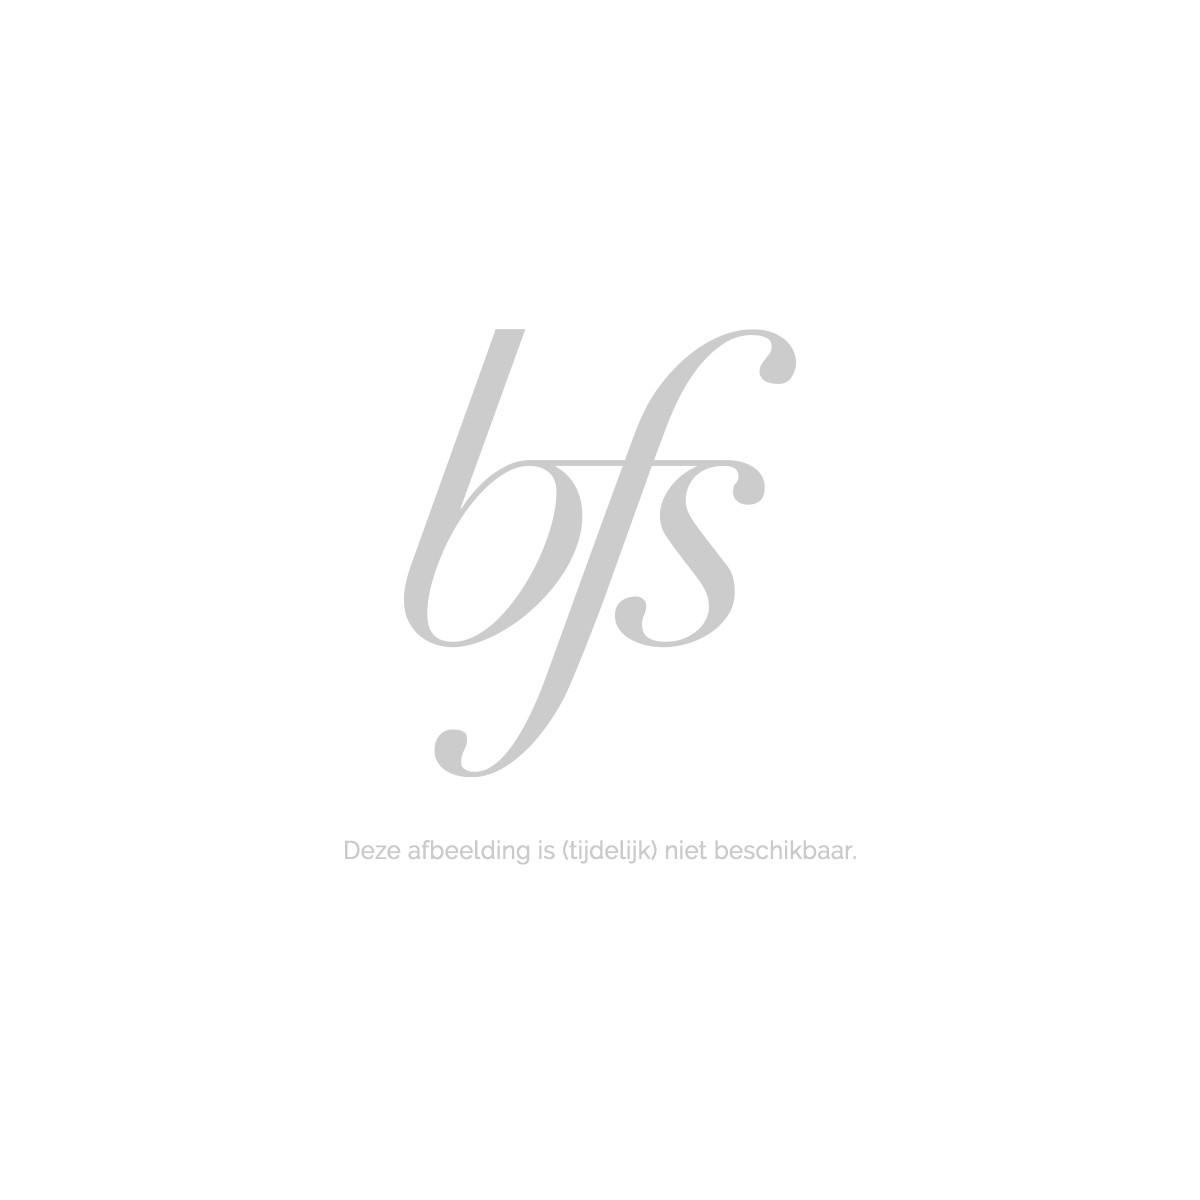 Biosilk Summer Therapy Silk Protect 167 Ml